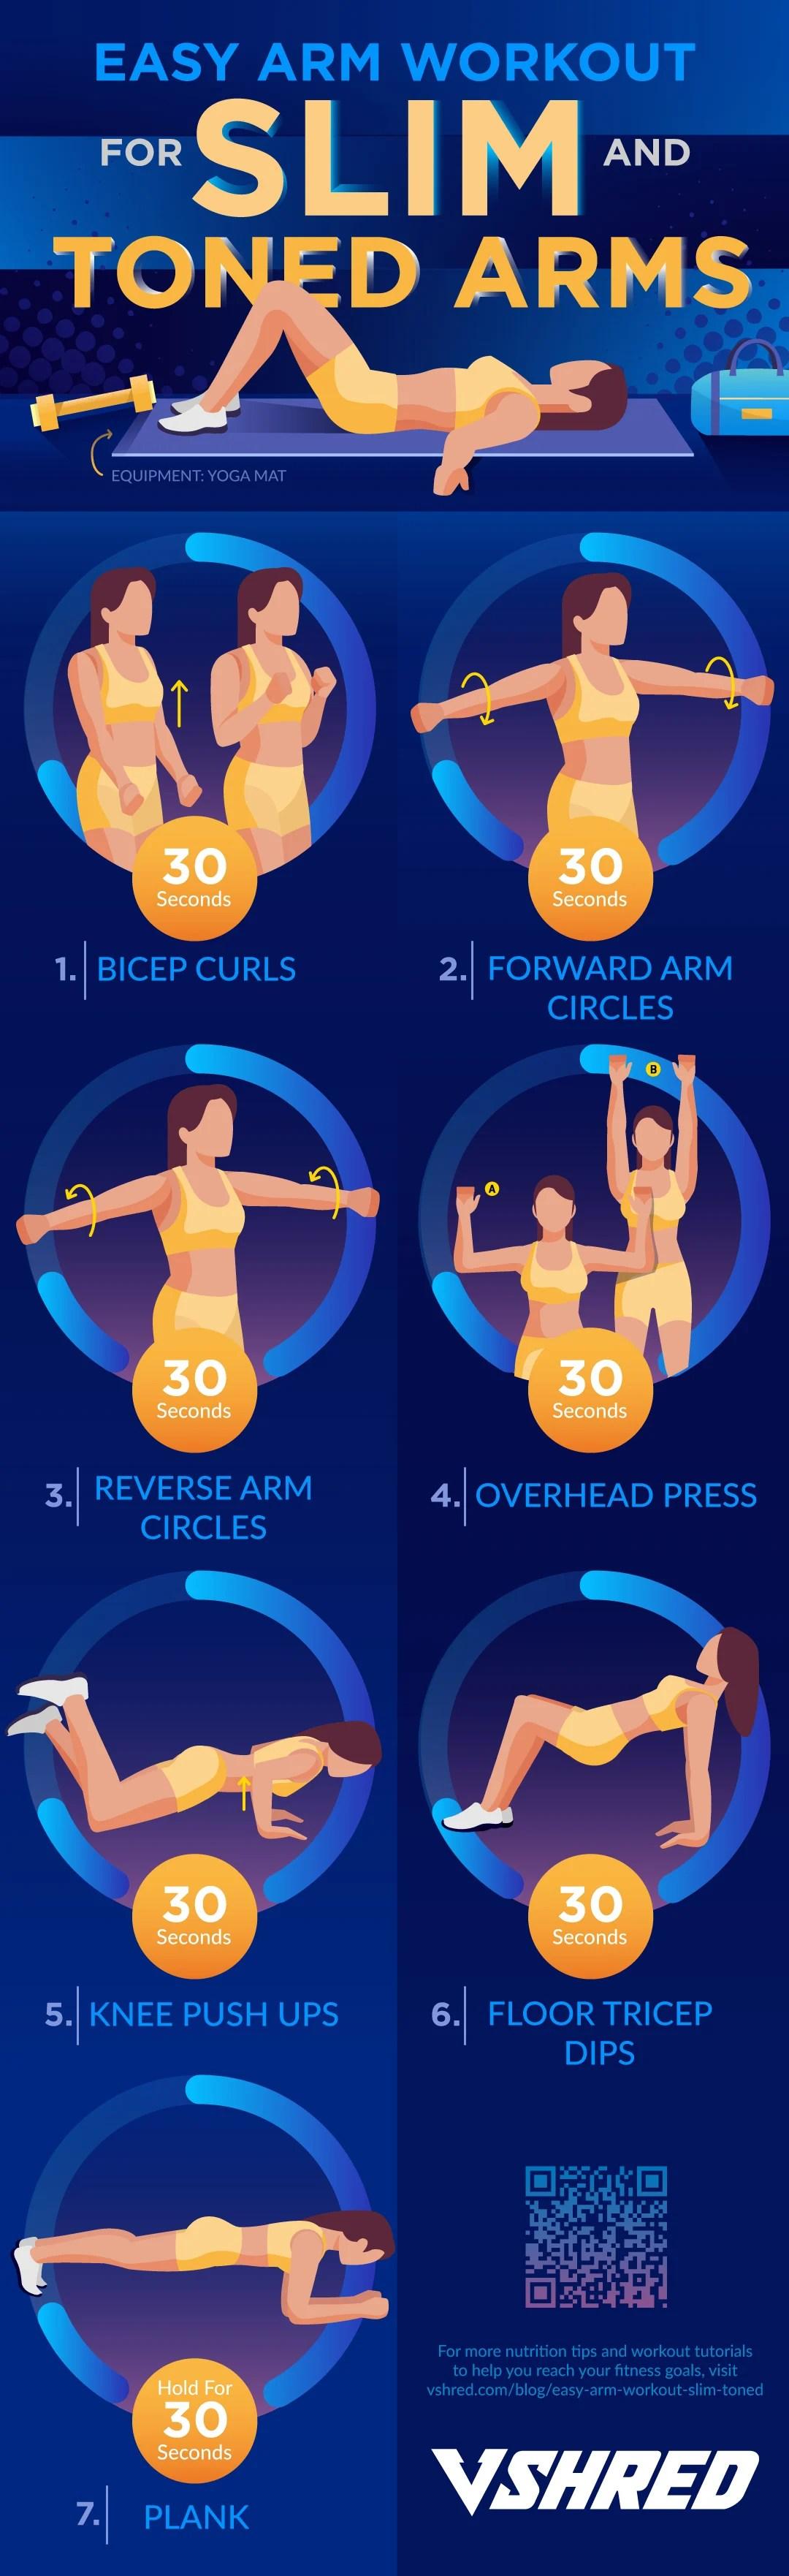 Ways to slim down arms